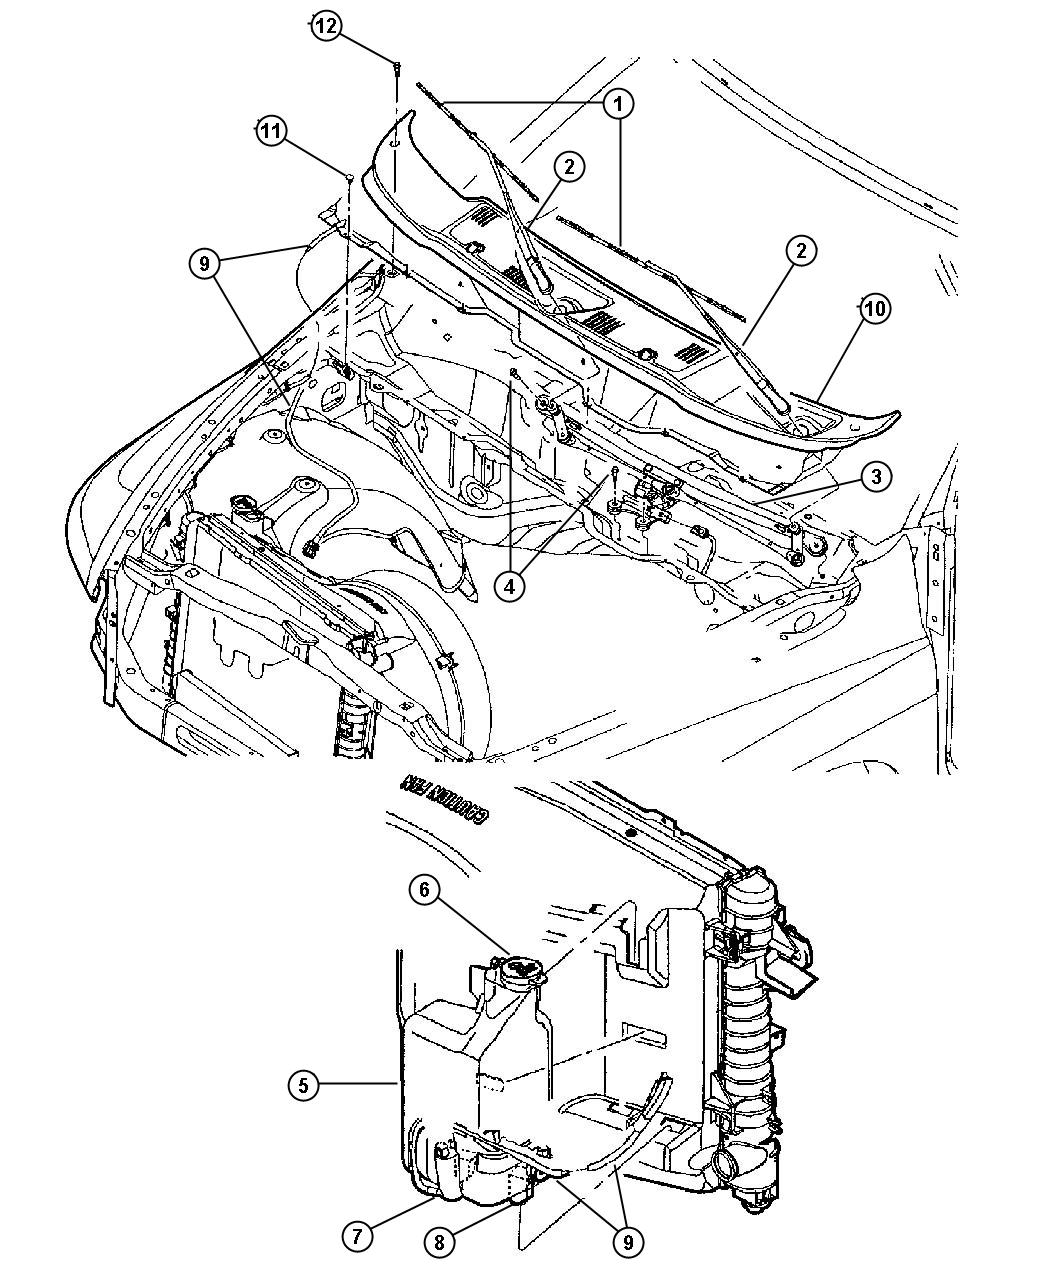 2003 Dodge Ram 2500 Module. Wiper. Windshield, washer